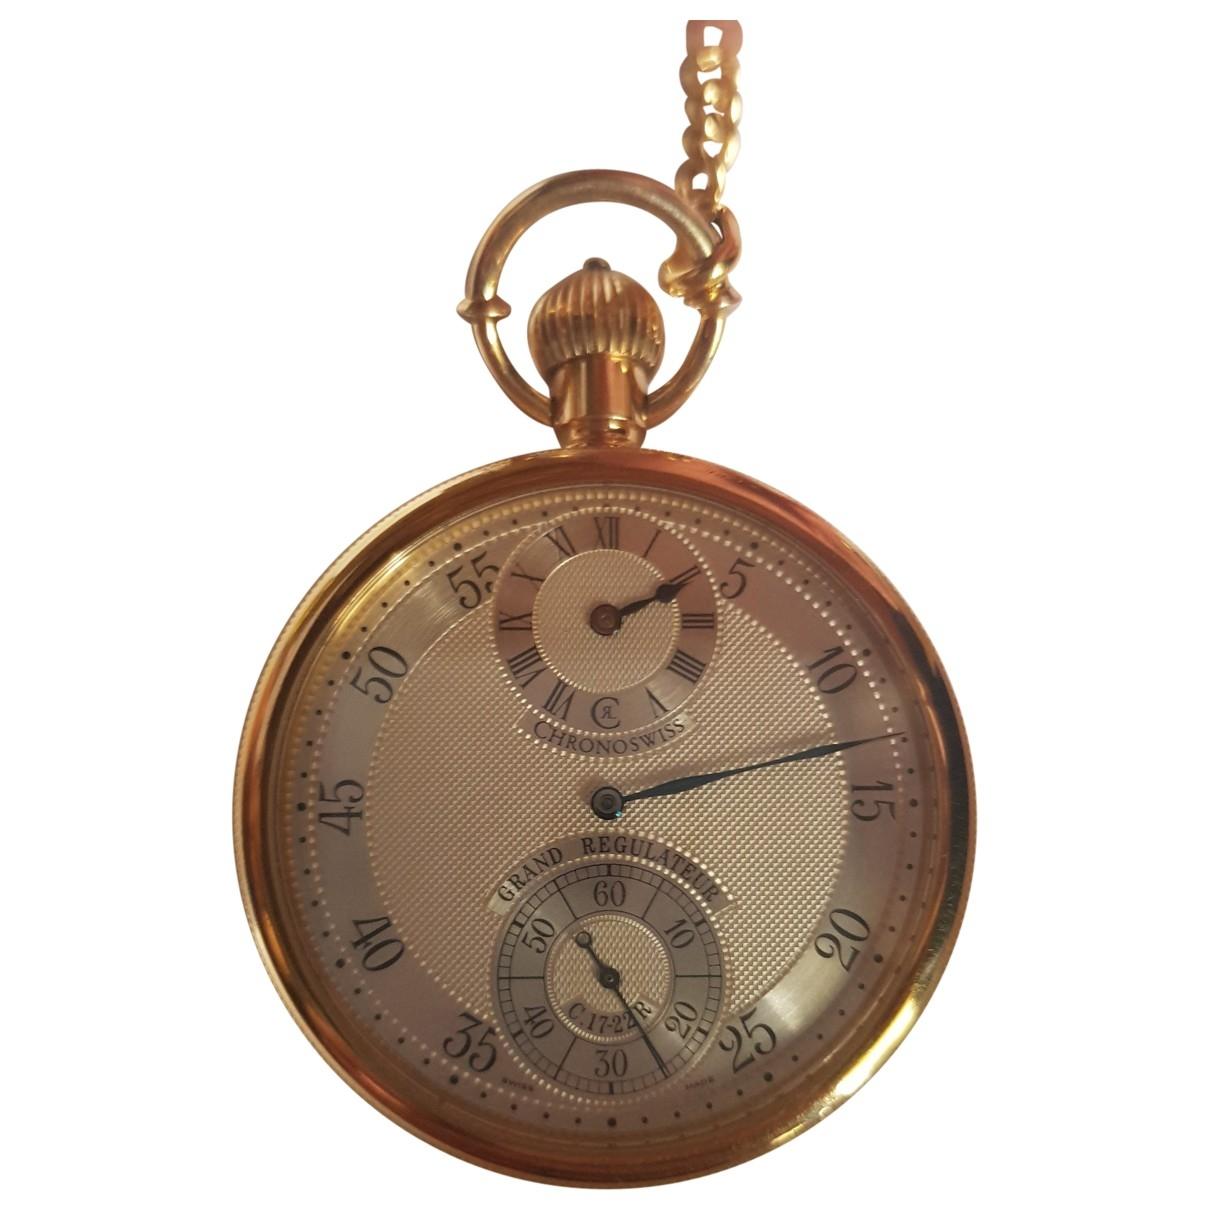 Chronographe Suisse \N Uhr in  Gelb Gelbgold